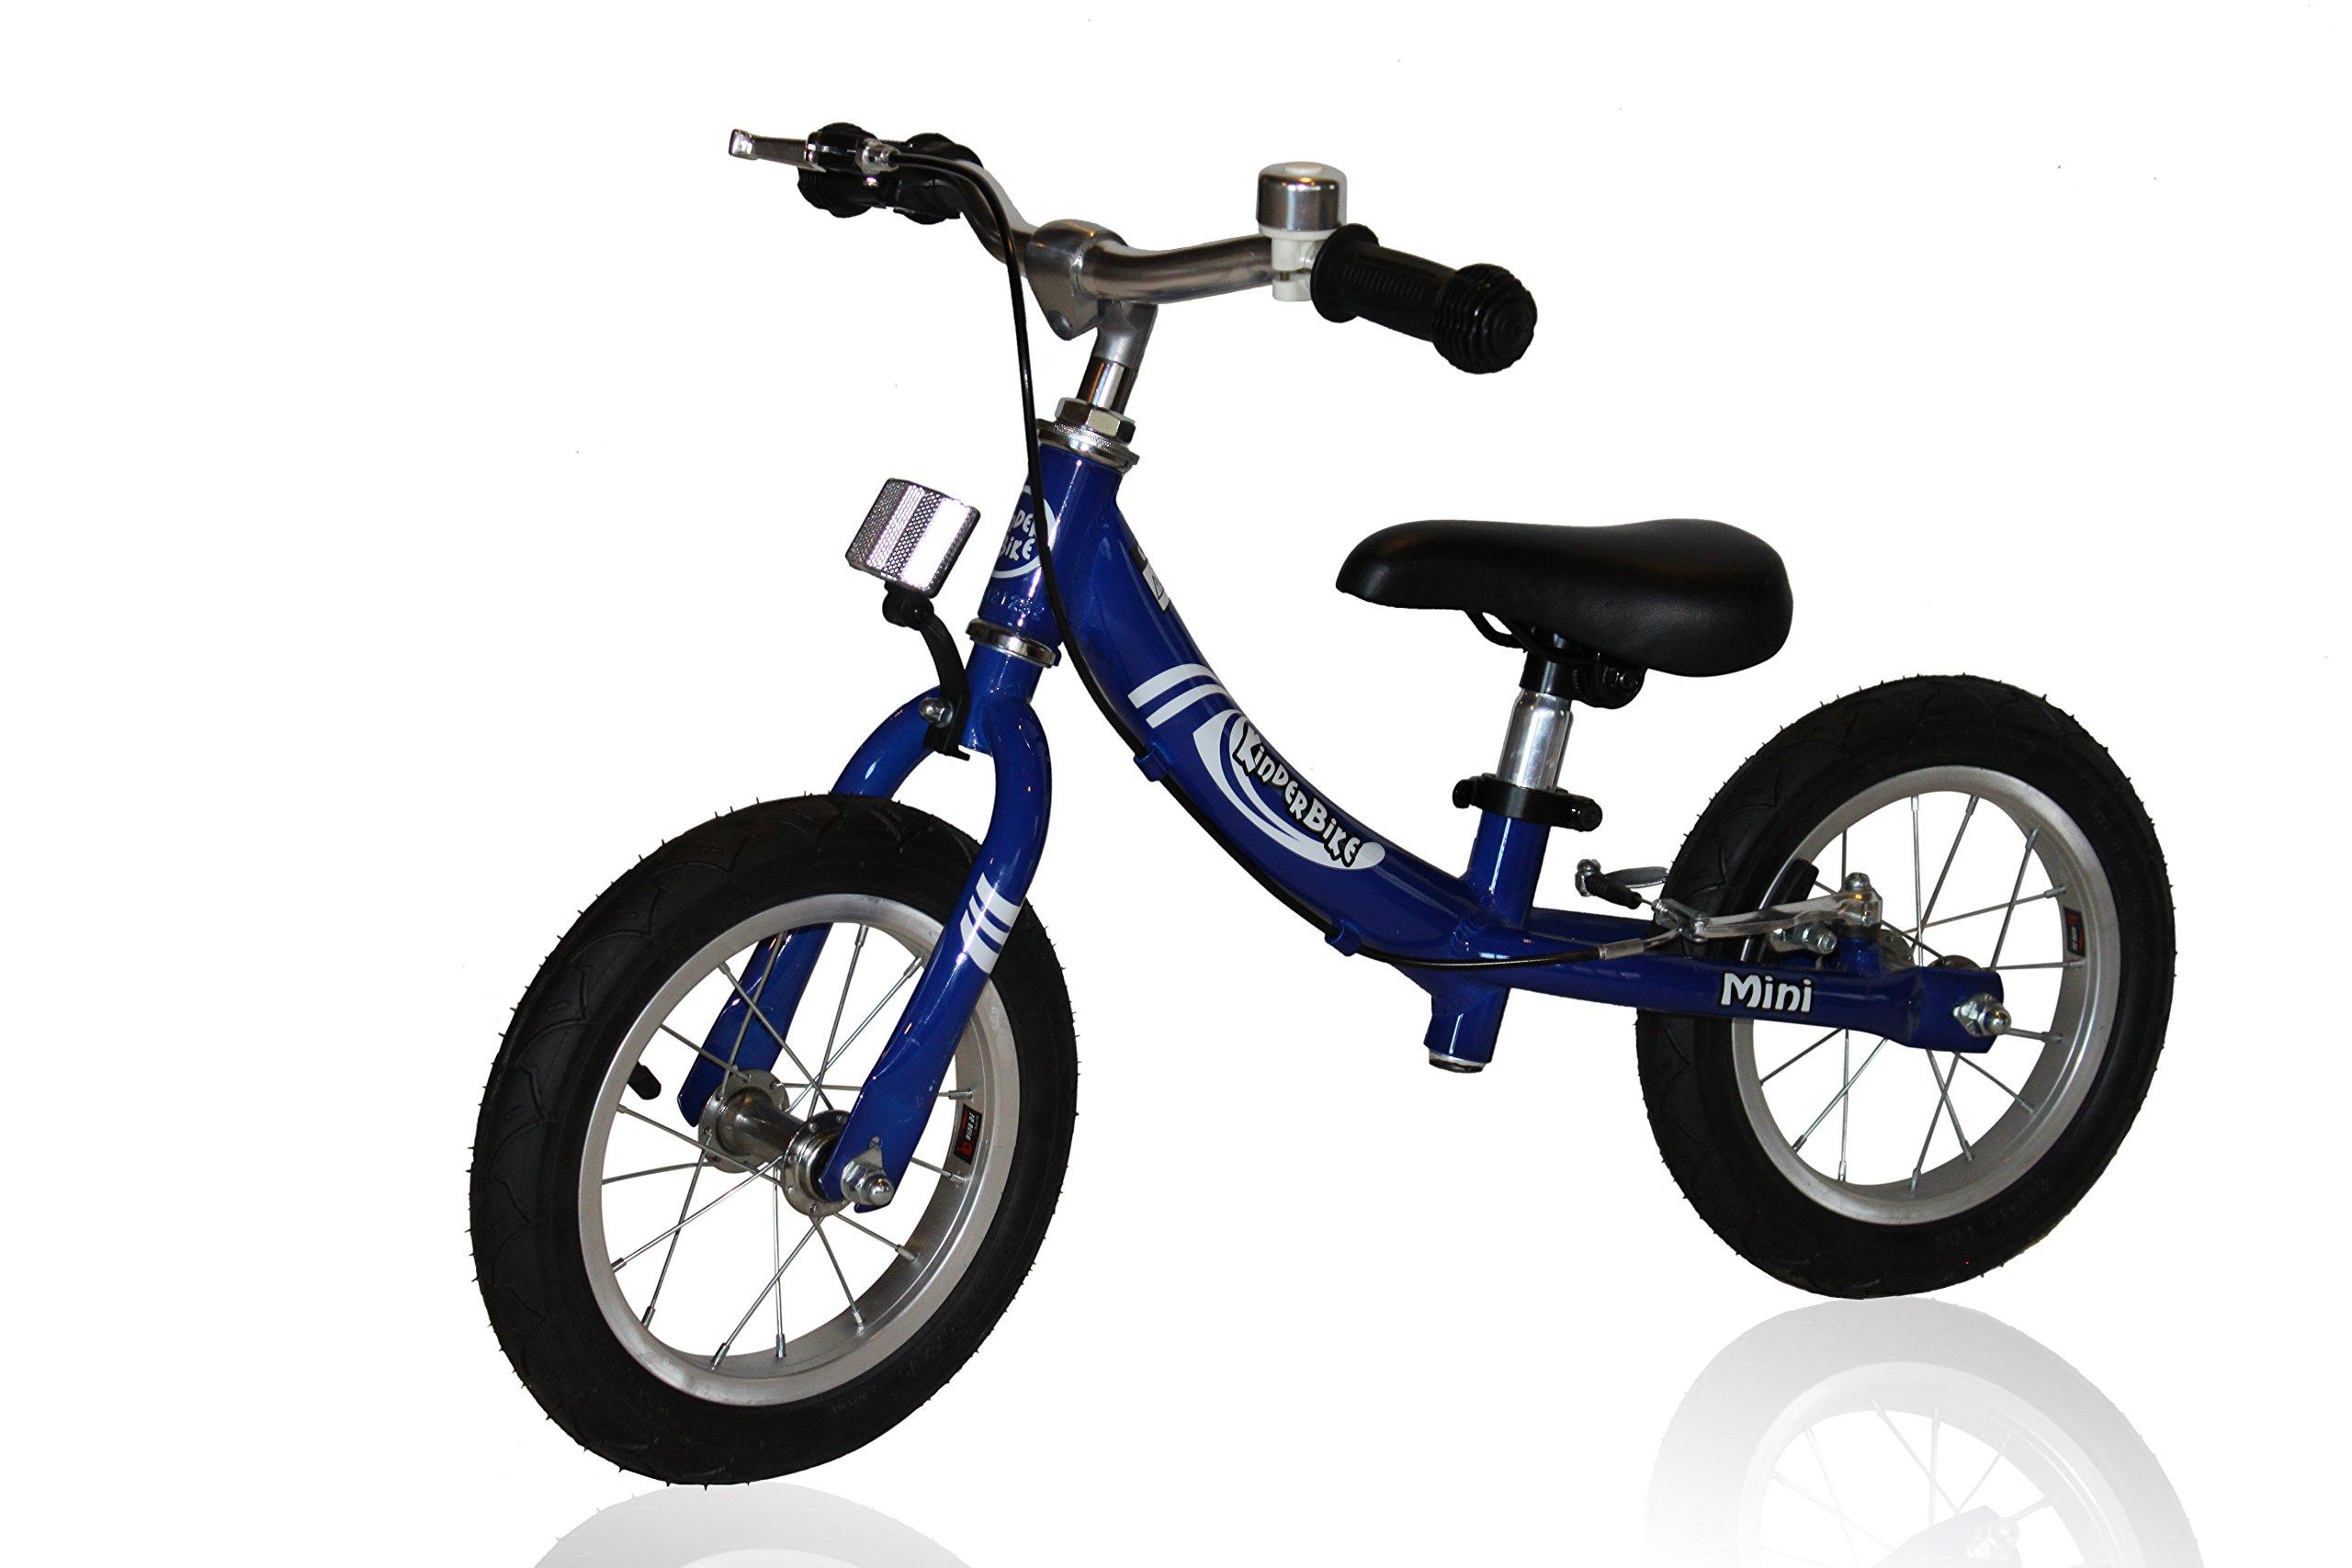 *NEW* 2015 KinderBike MINI - Balance Bike/ Run Bike by KinderBike